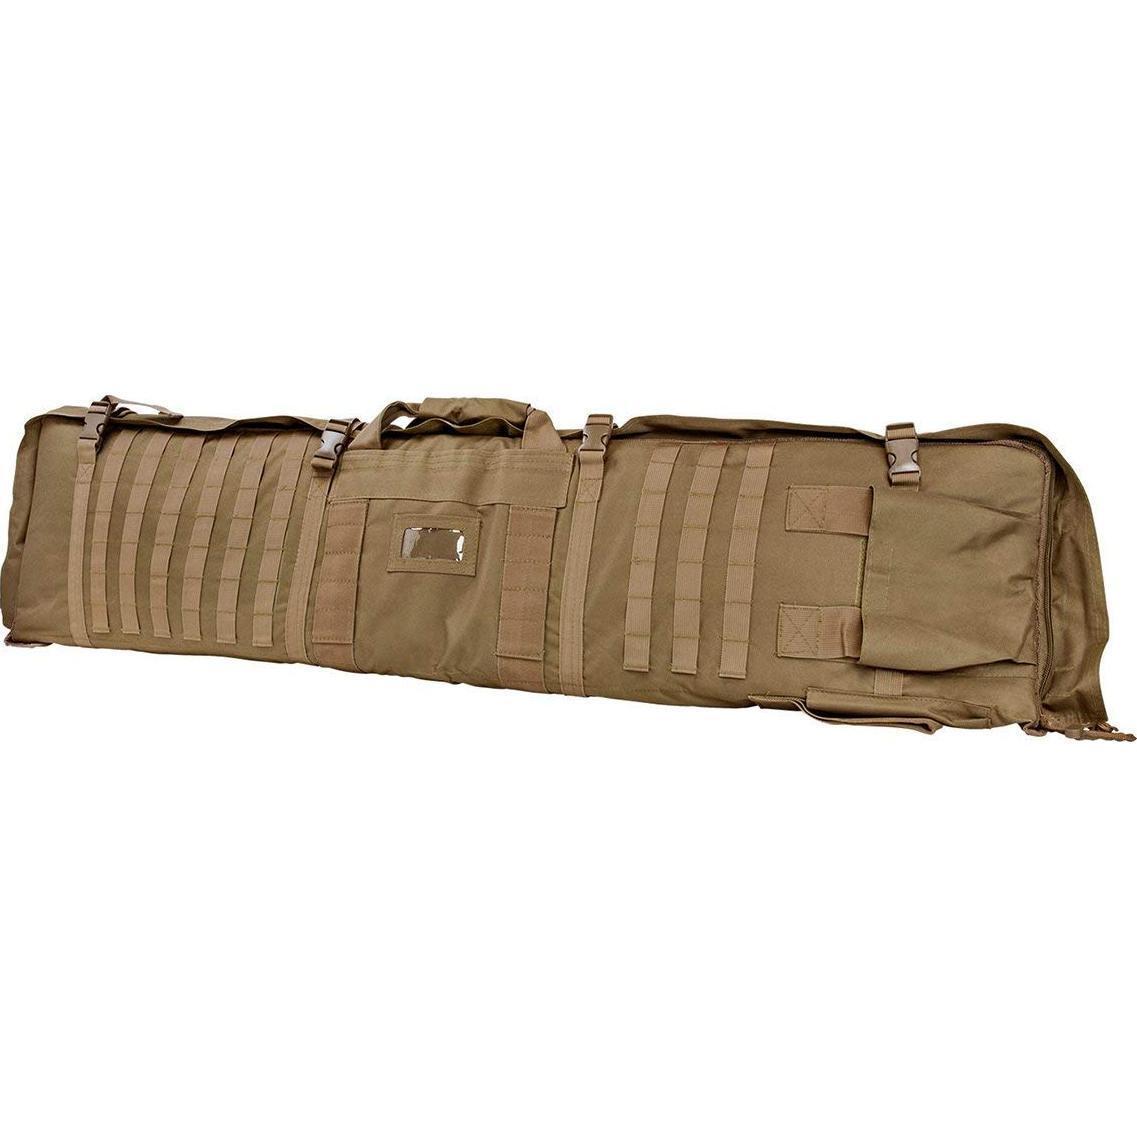 NCSTAR Tactical 48  tan maletín para rifles que se despliega a una estera de disparo de 66